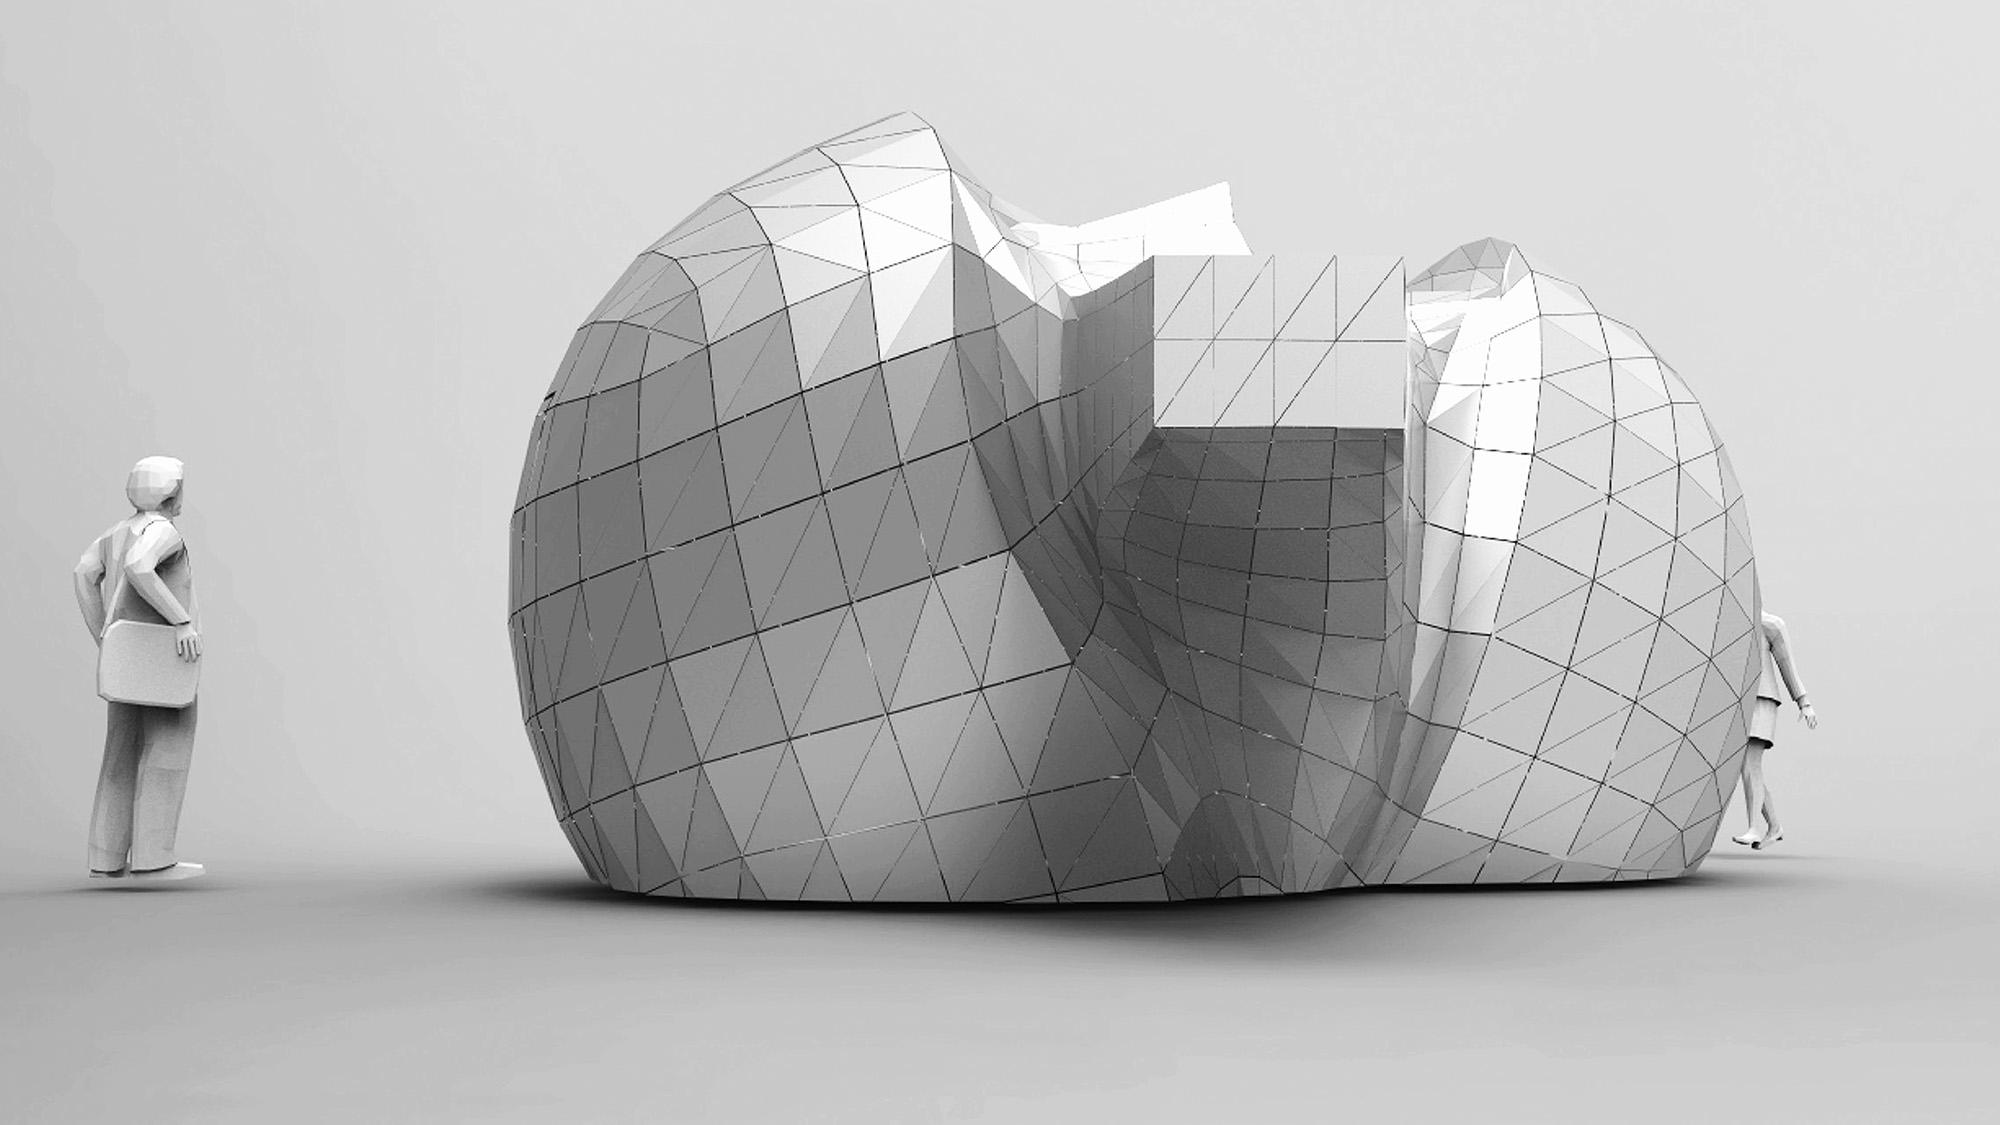 Design COOP Himmelblau 2014